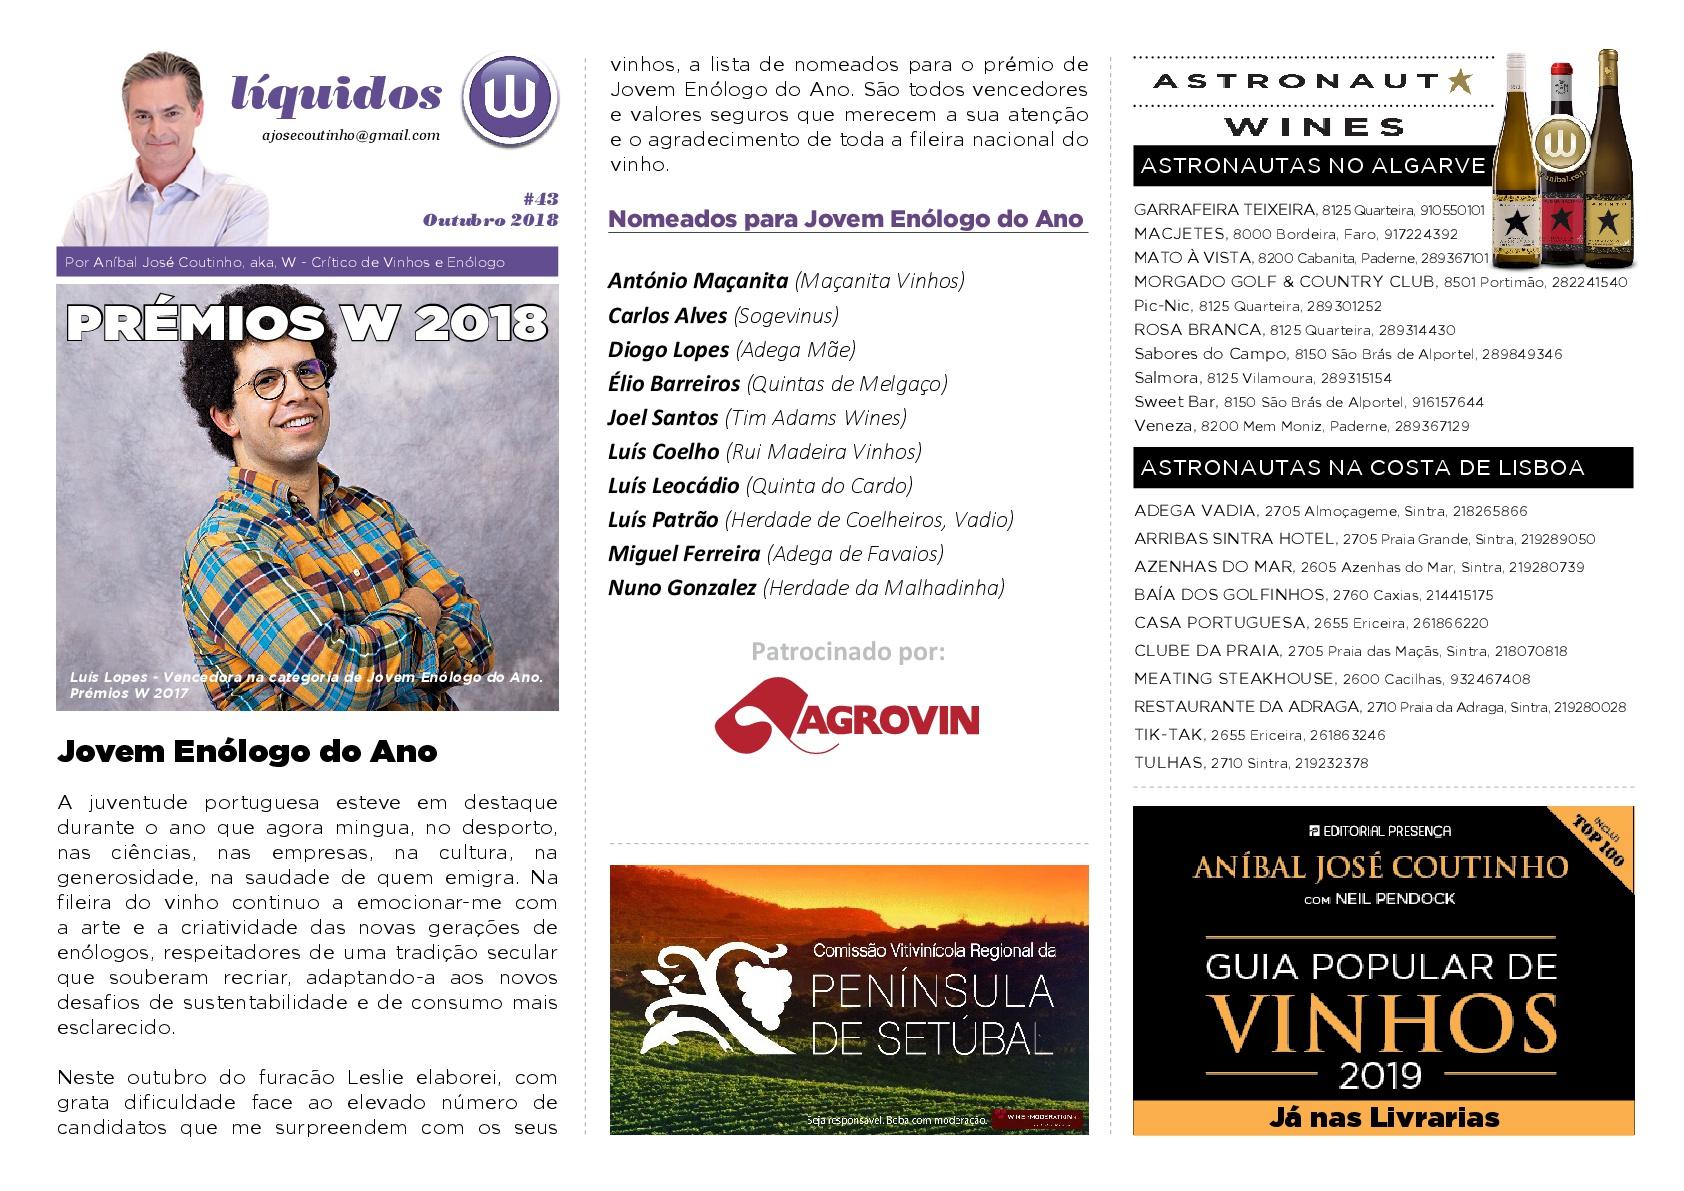 Newsletter Premio Joven Enólogo del año: Premios Anibal Coutinho 2018